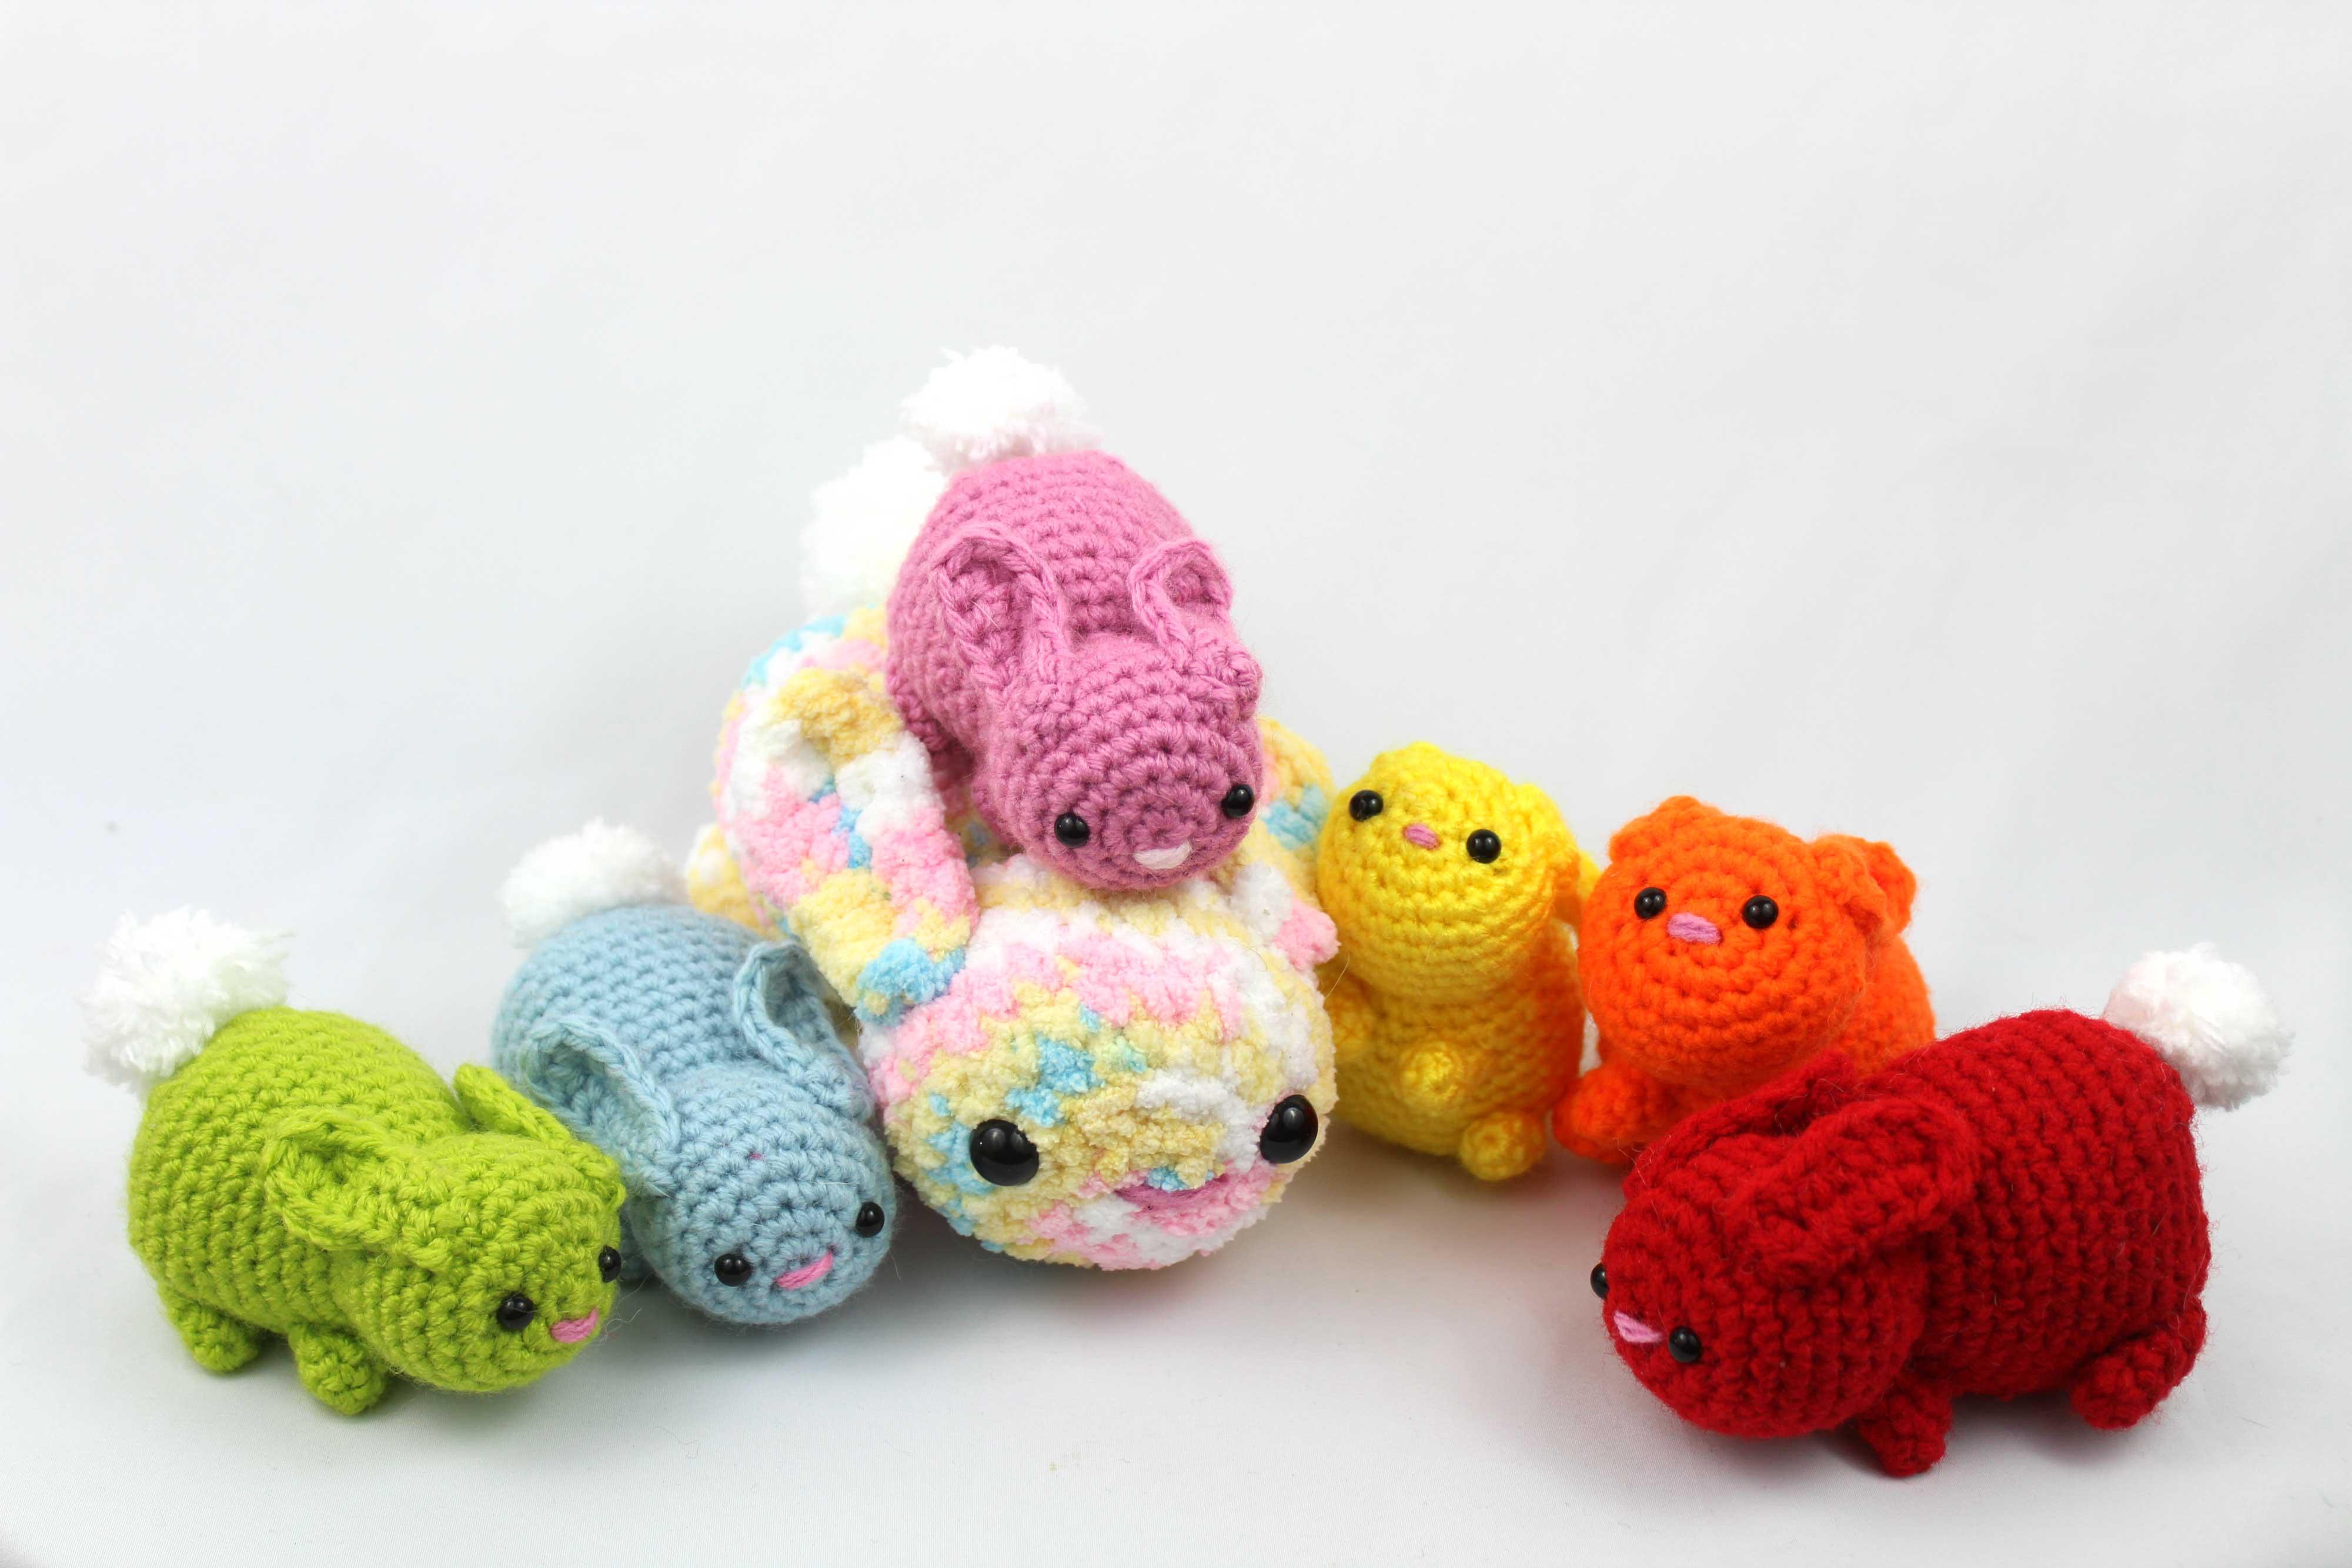 Bunny Crochet Amigurumi Pattern by Little Bear Crochets - Hobium Blog   2667x4000